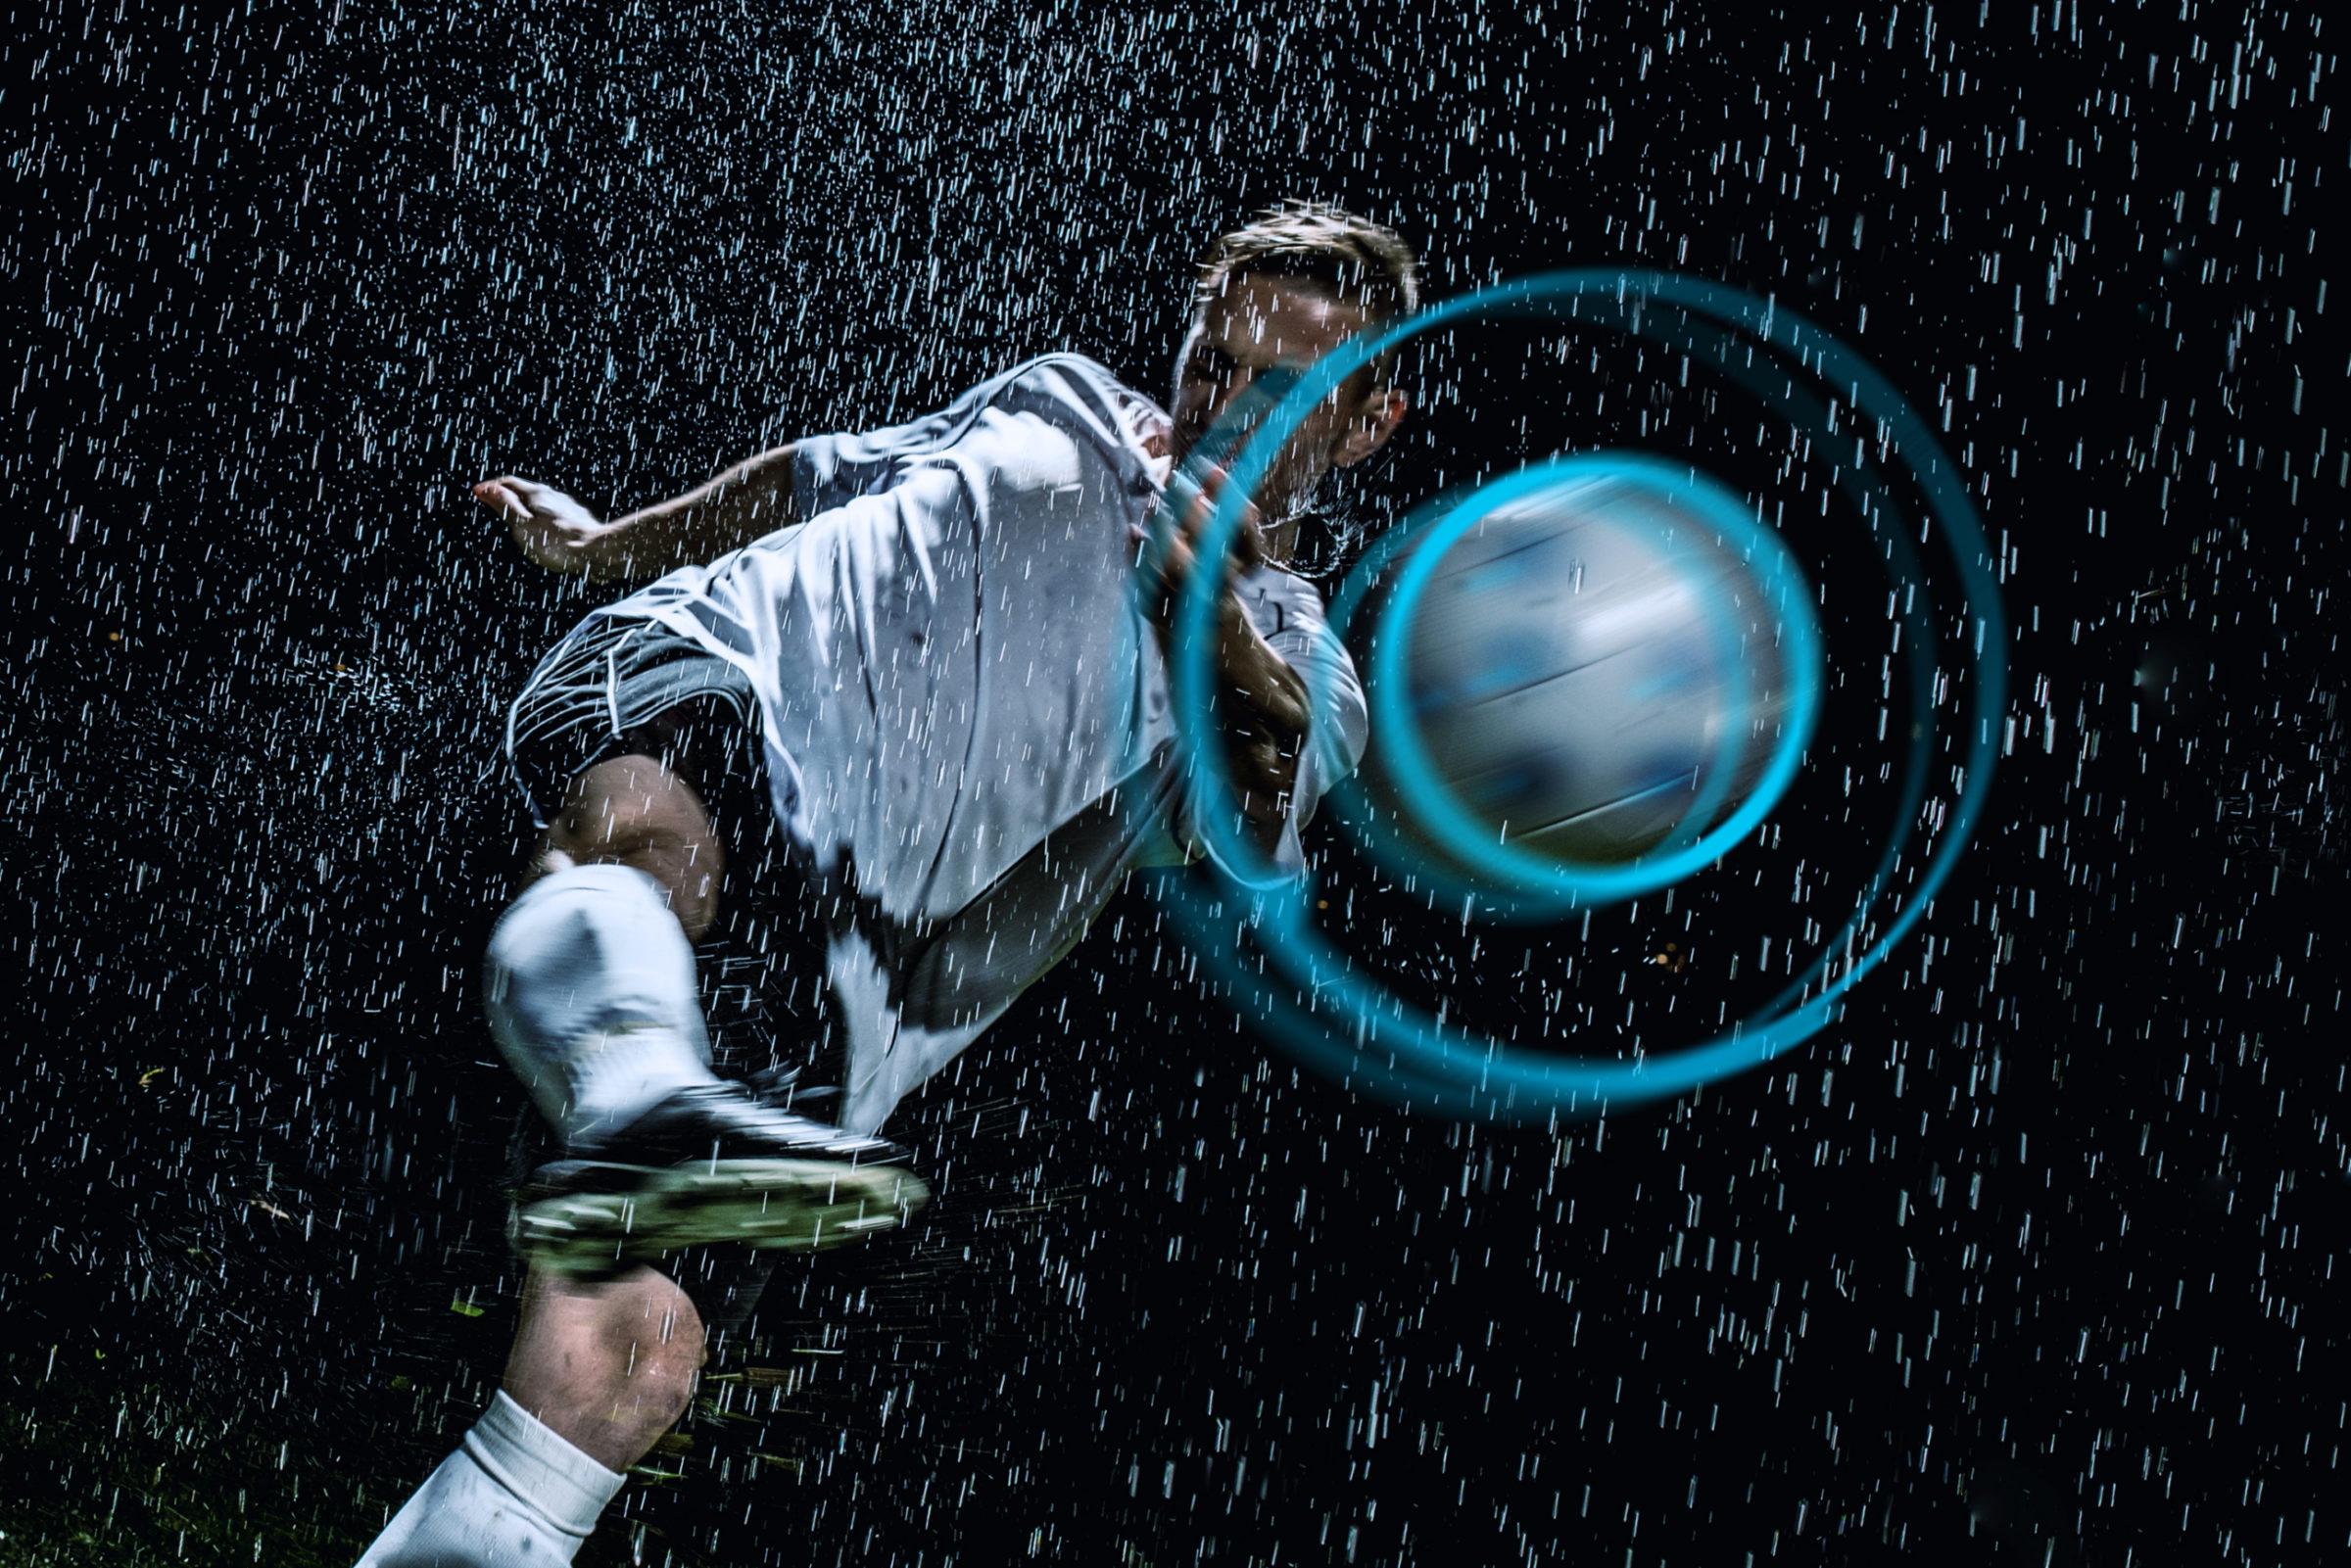 KINEXON soccer sports action